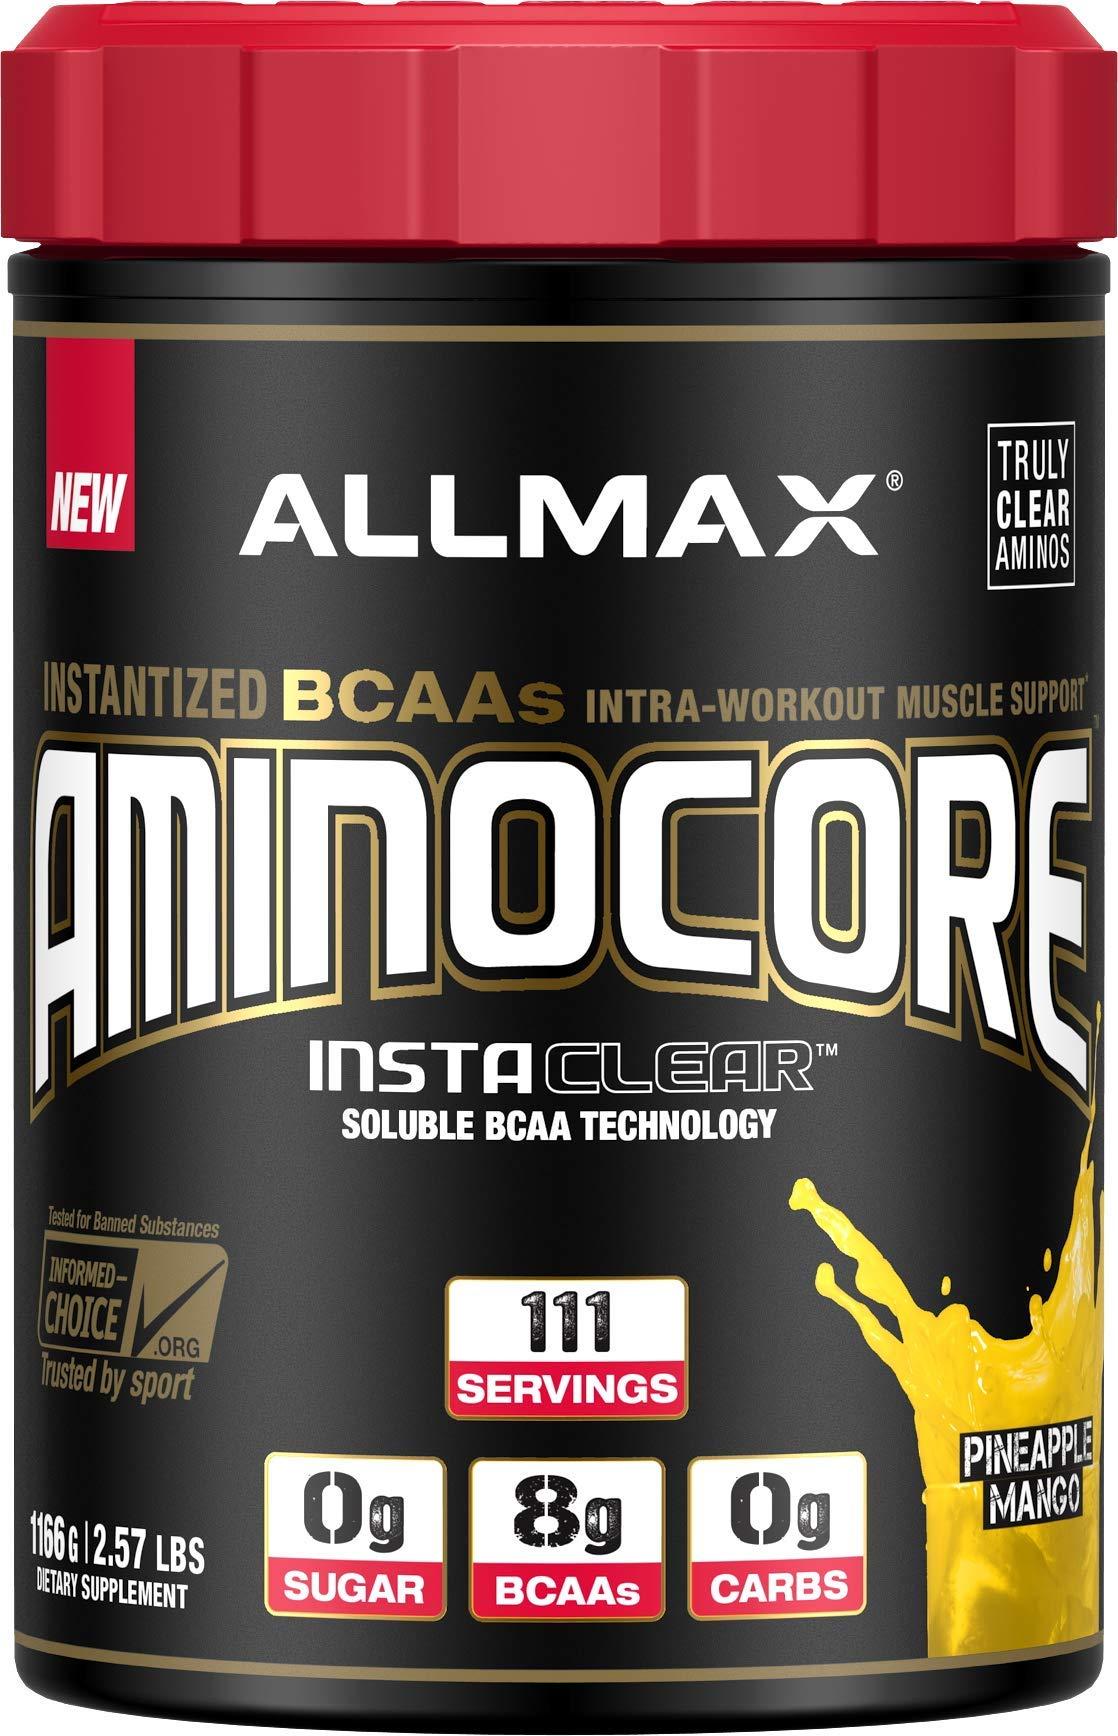 ALLMAX Nutrition Aminocore BCAAs, 100% Pure 45:30:25 Ratio, Pineapple Mango, 1166g